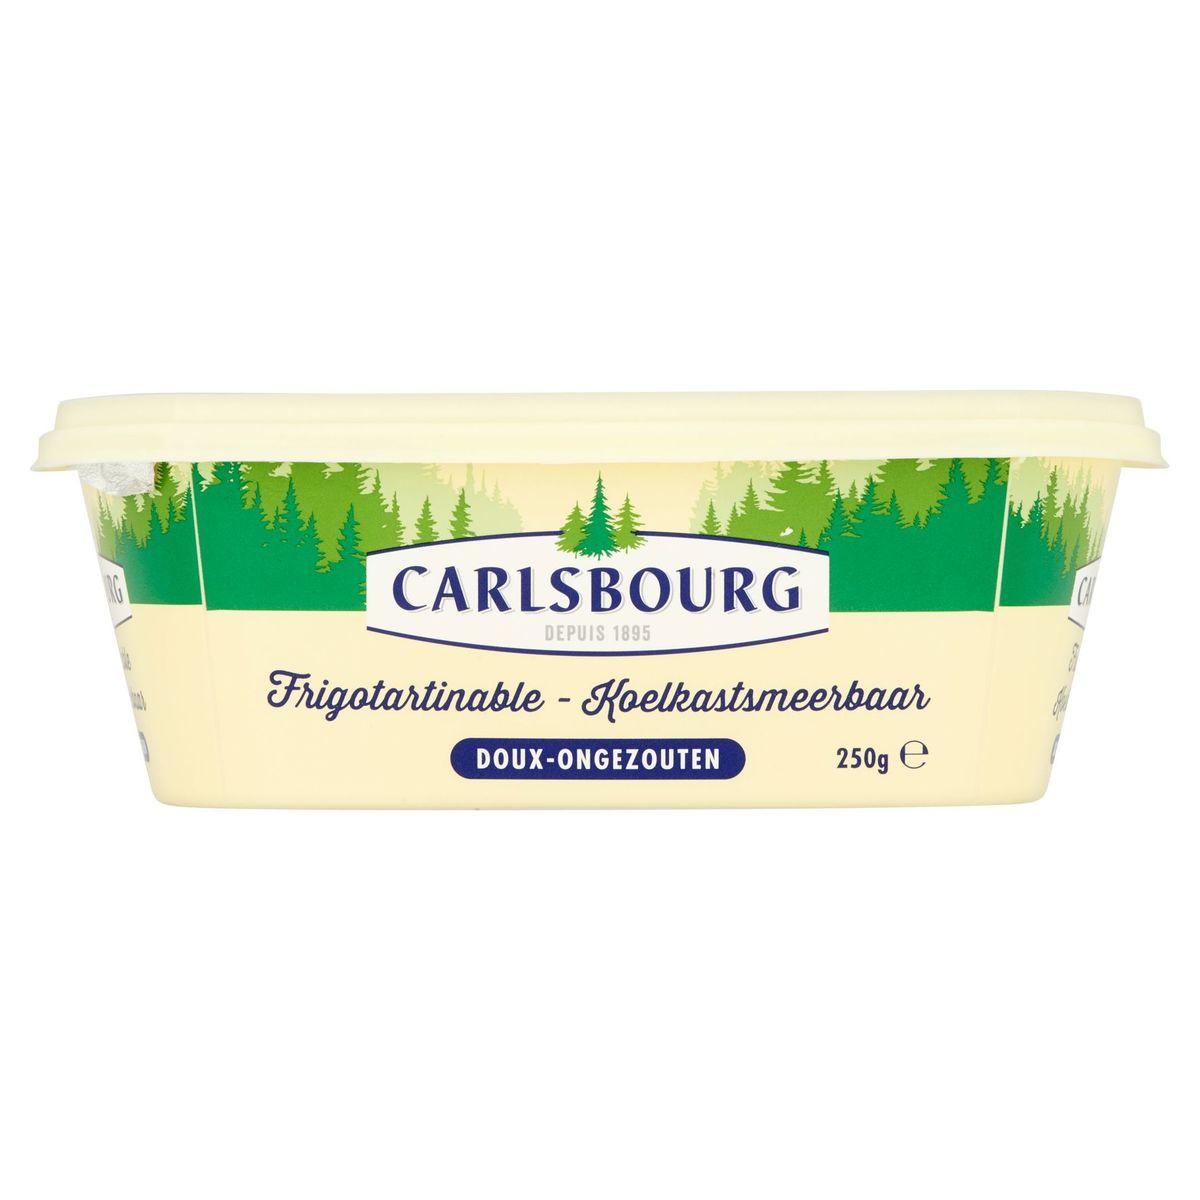 Carlsbourg Koelkastsmeerbaar Ongezouten 250 g